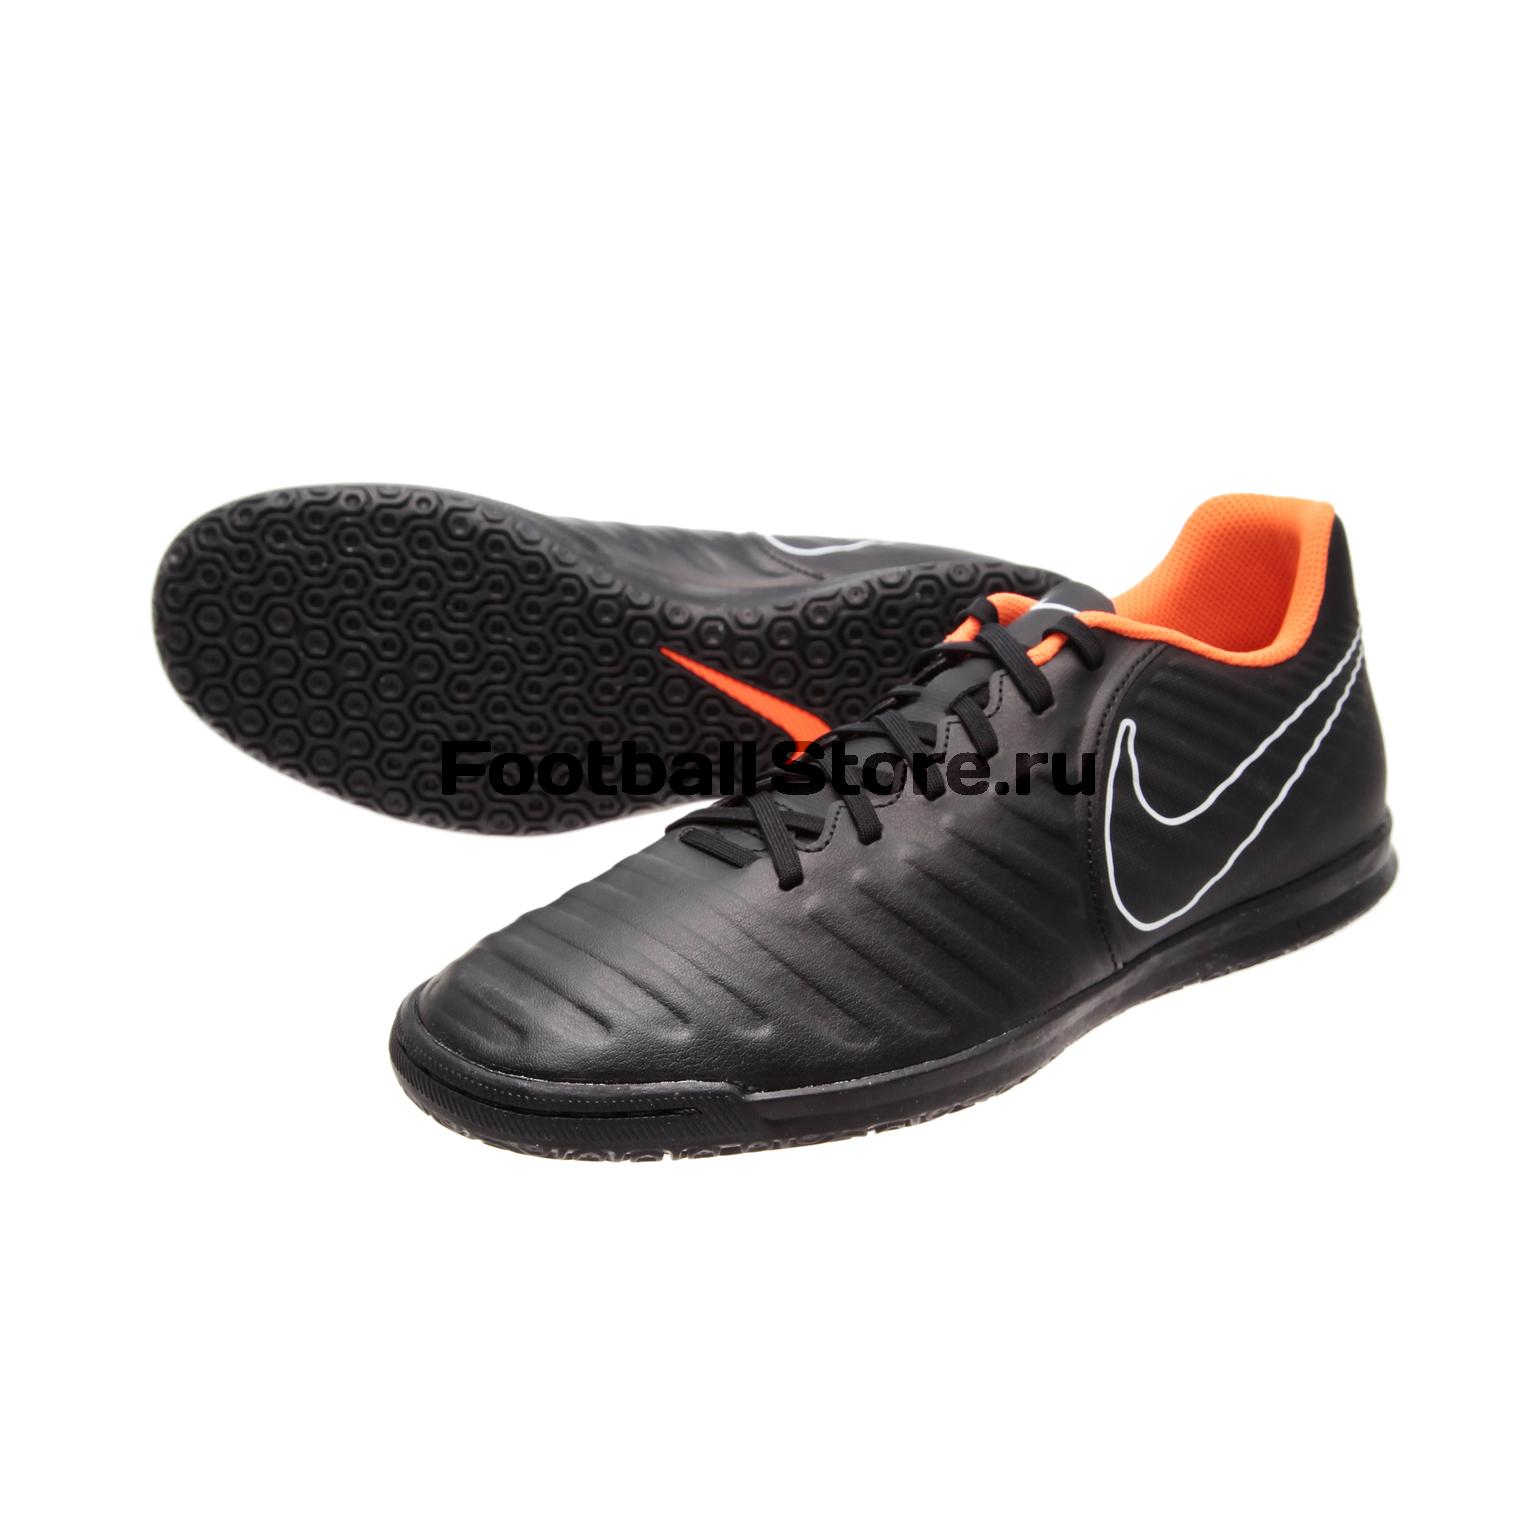 Обувь для зала Nike Обувь для зала Nike LegendX 7 Club IC AH7245-080 игровая форма nike футболка детская nike ss precision iii jsy boys 645918 410